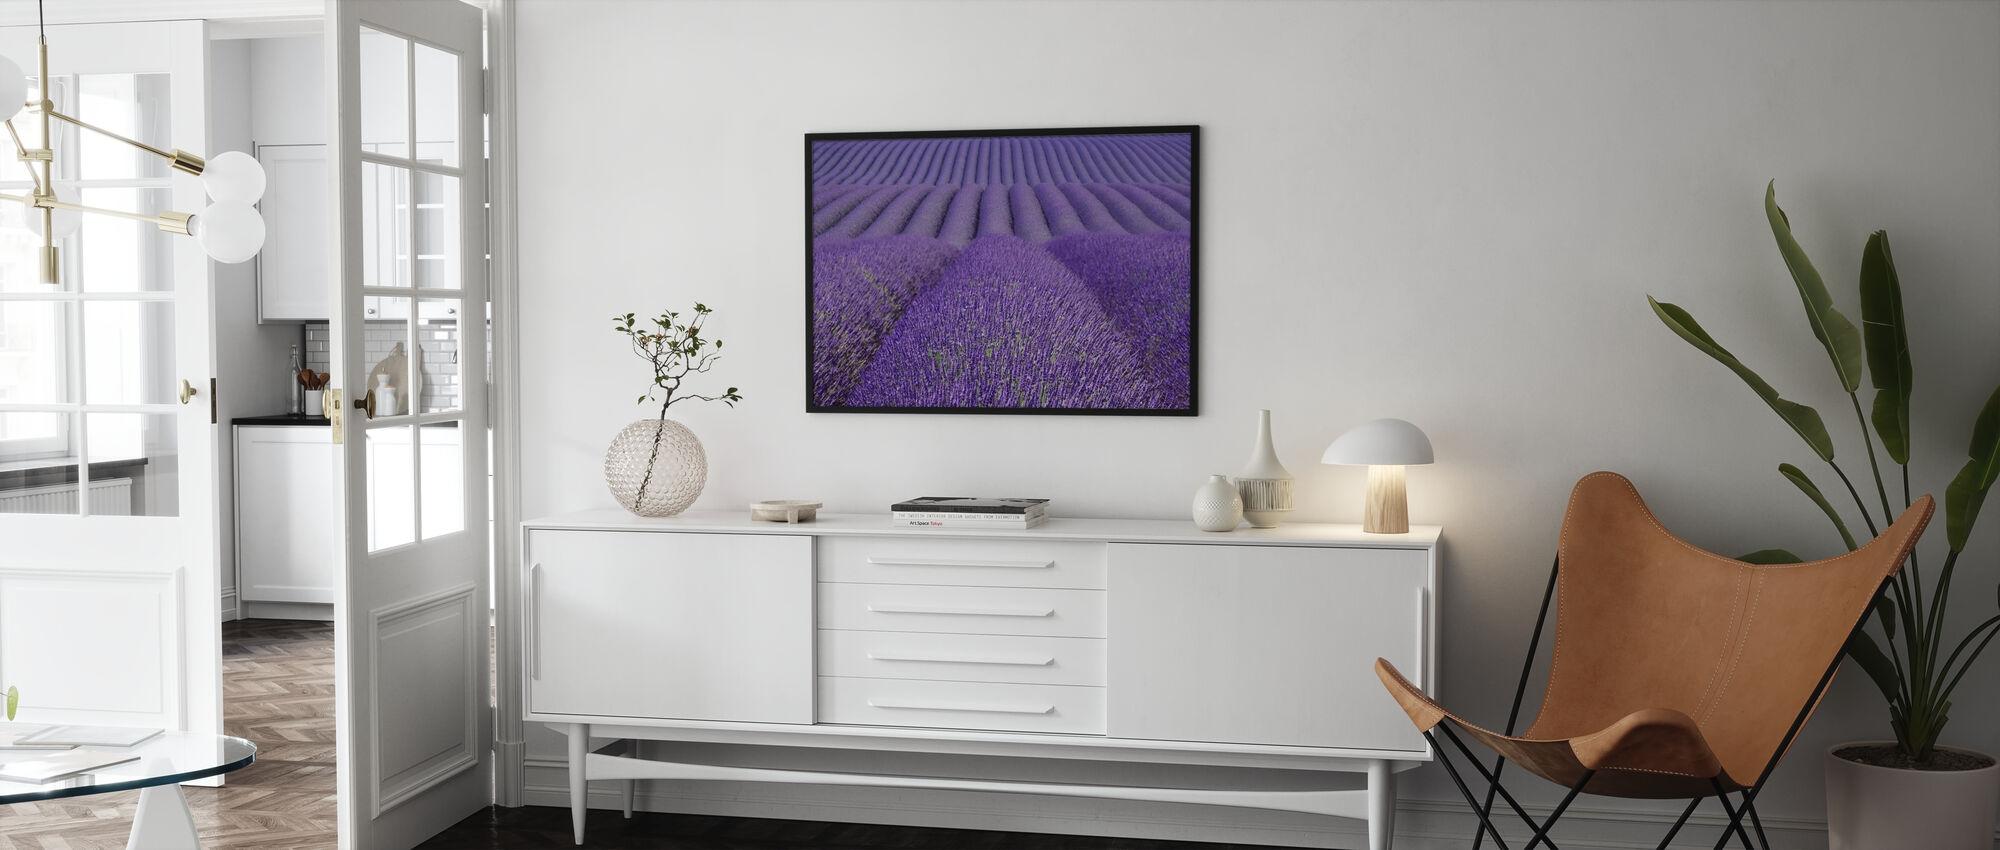 Purple Lavender Field - Poster - Living Room